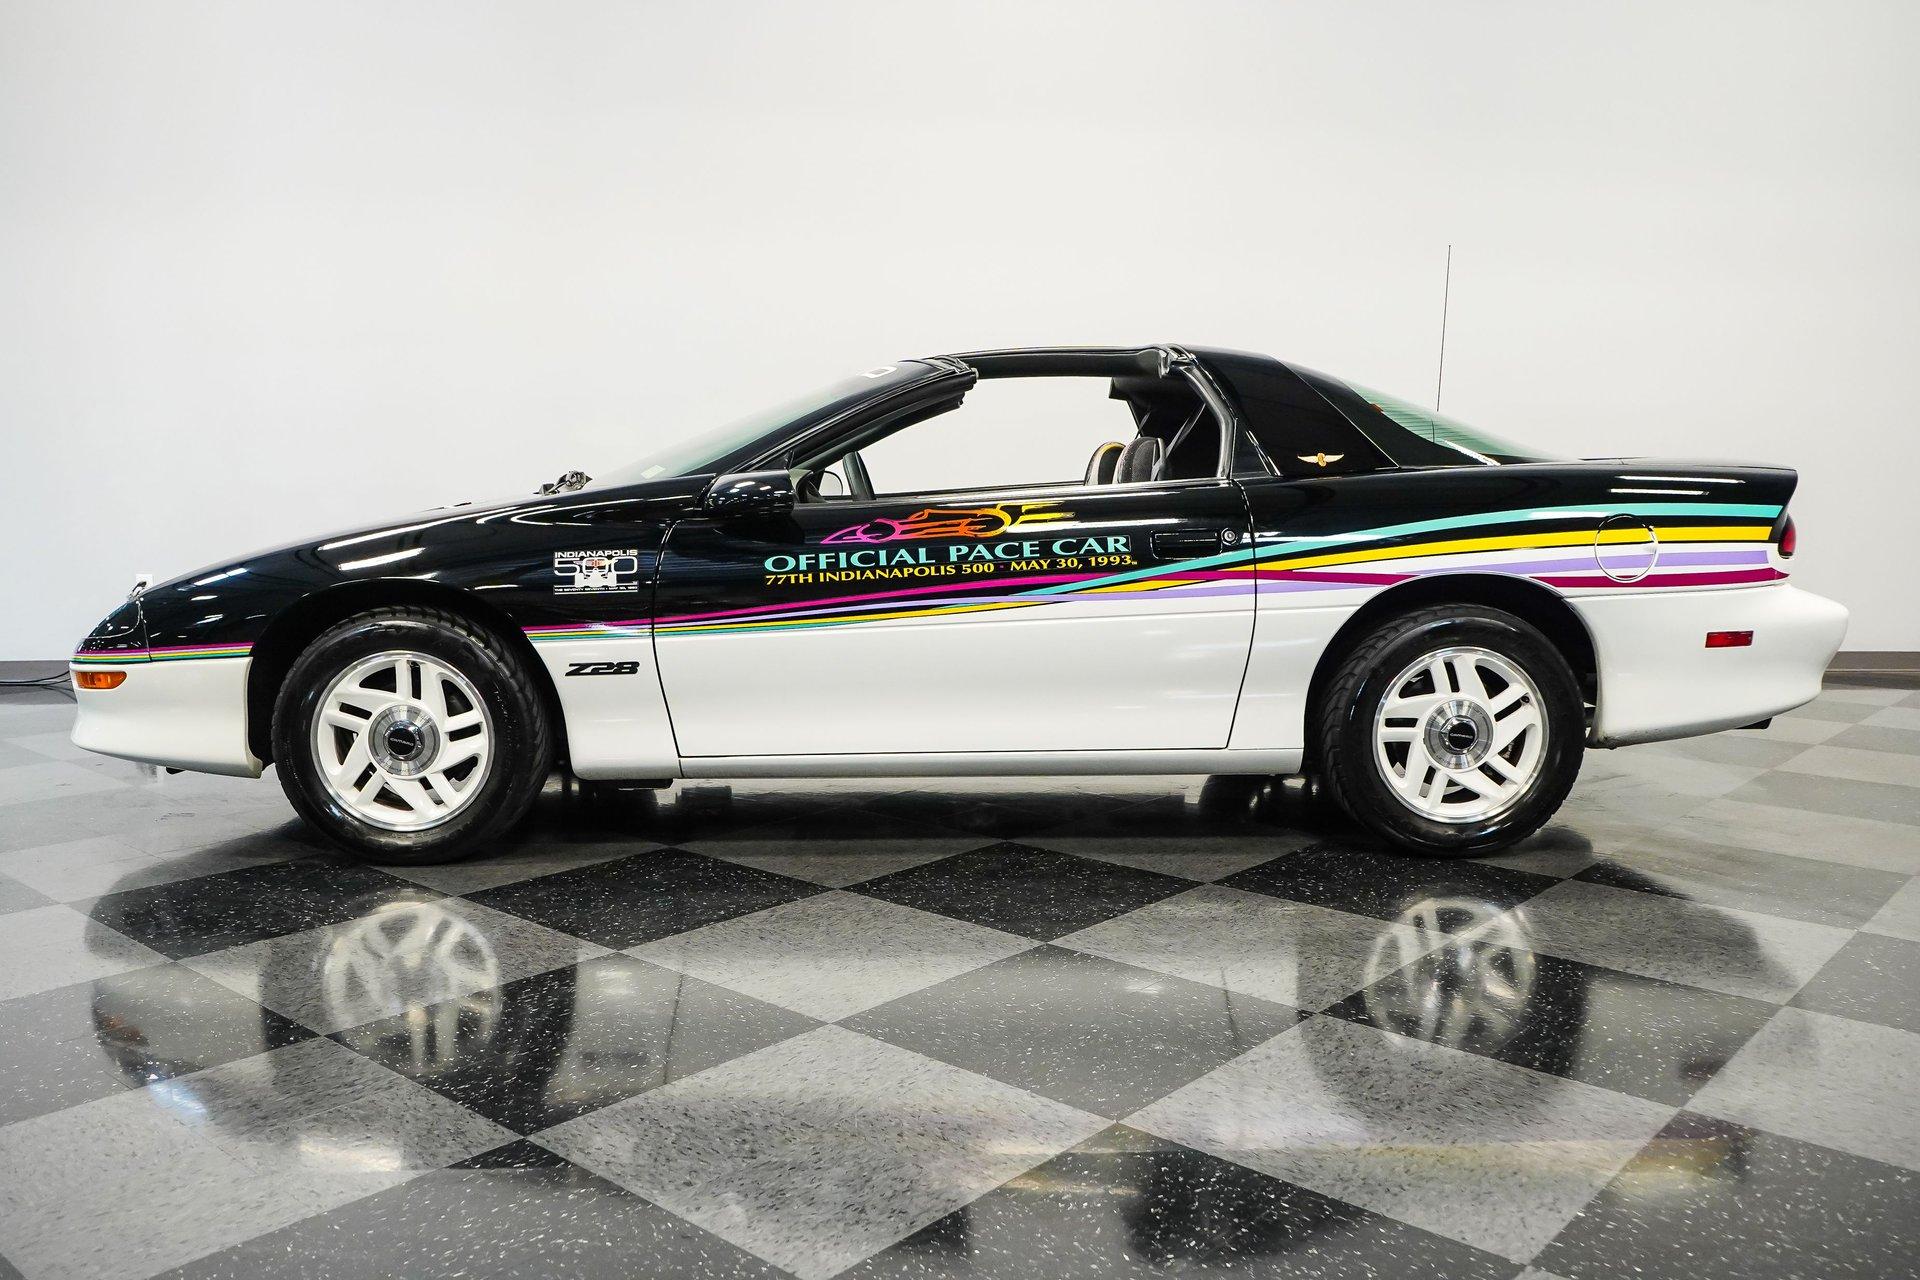 1993 chevrolet camaro z 28 indianapolis 500 pace car